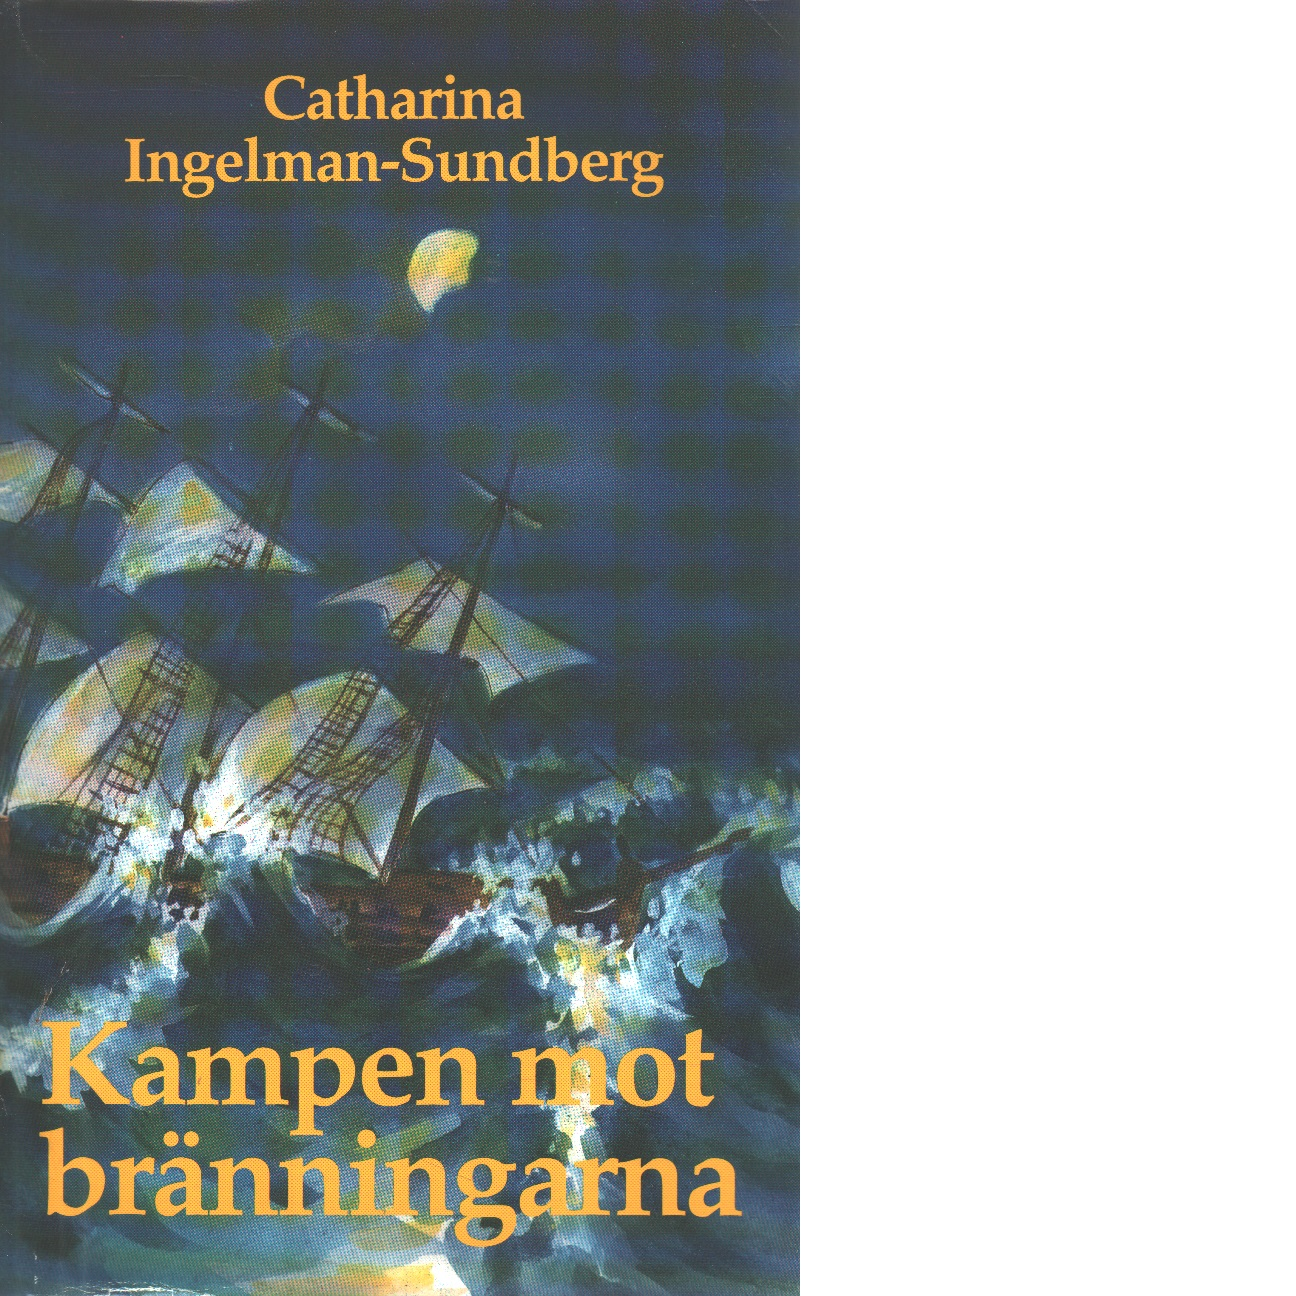 Kampen mot bränningarna - Ingelman-sundberg, Catharina